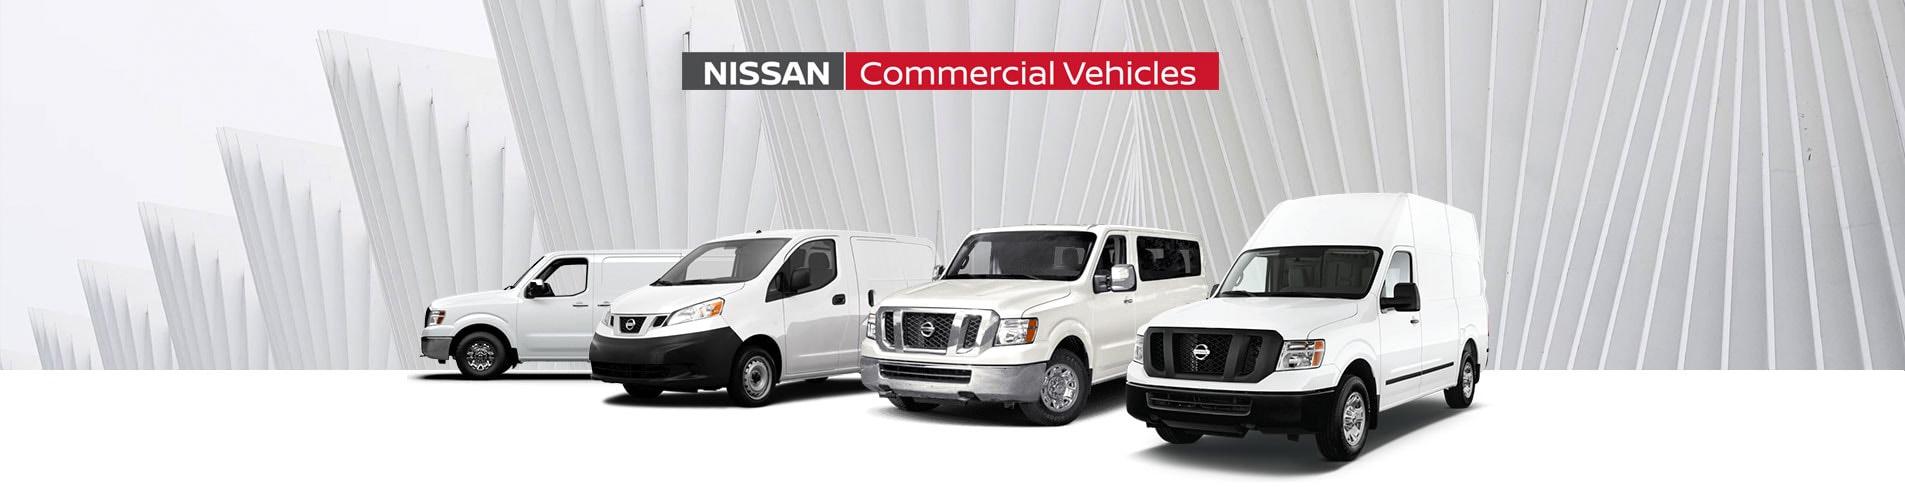 Nissan Commercial Vehicles Winnipeg